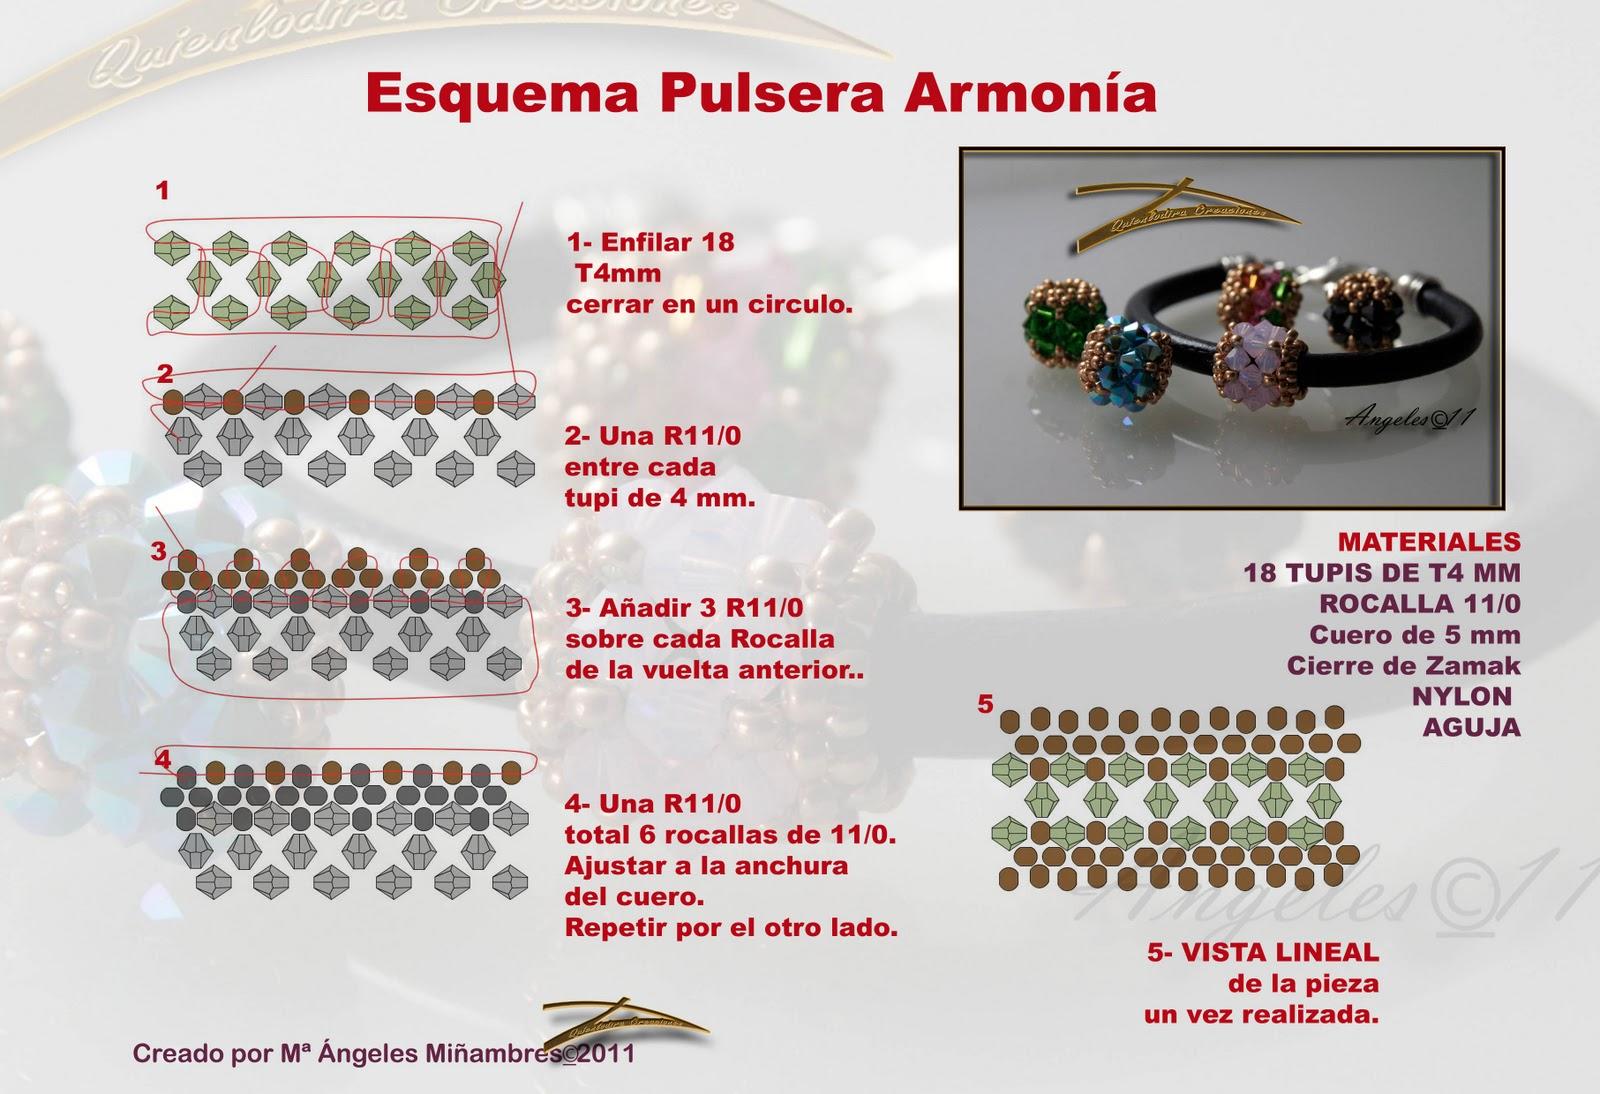 http://2.bp.blogspot.com/-5WGLiiM6rhg/TrLZPdcj-0I/AAAAAAAAKYM/tcg9nEefP-E/s1600/Esquema+pulsera+Armonia.jpg.jpg